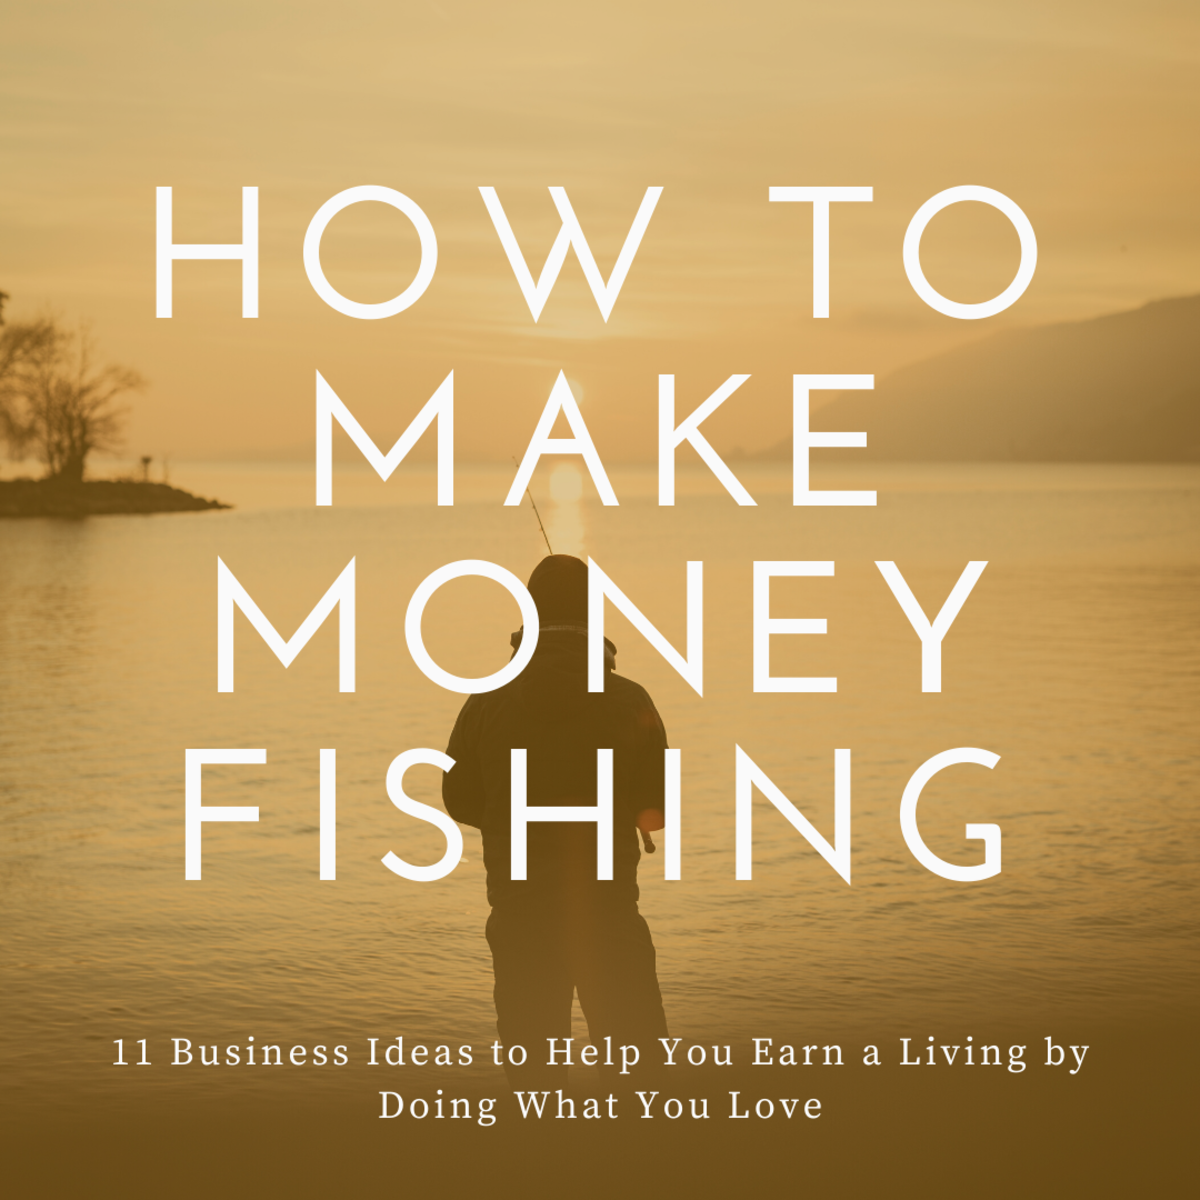 11 Ways to Make Money From Fishing